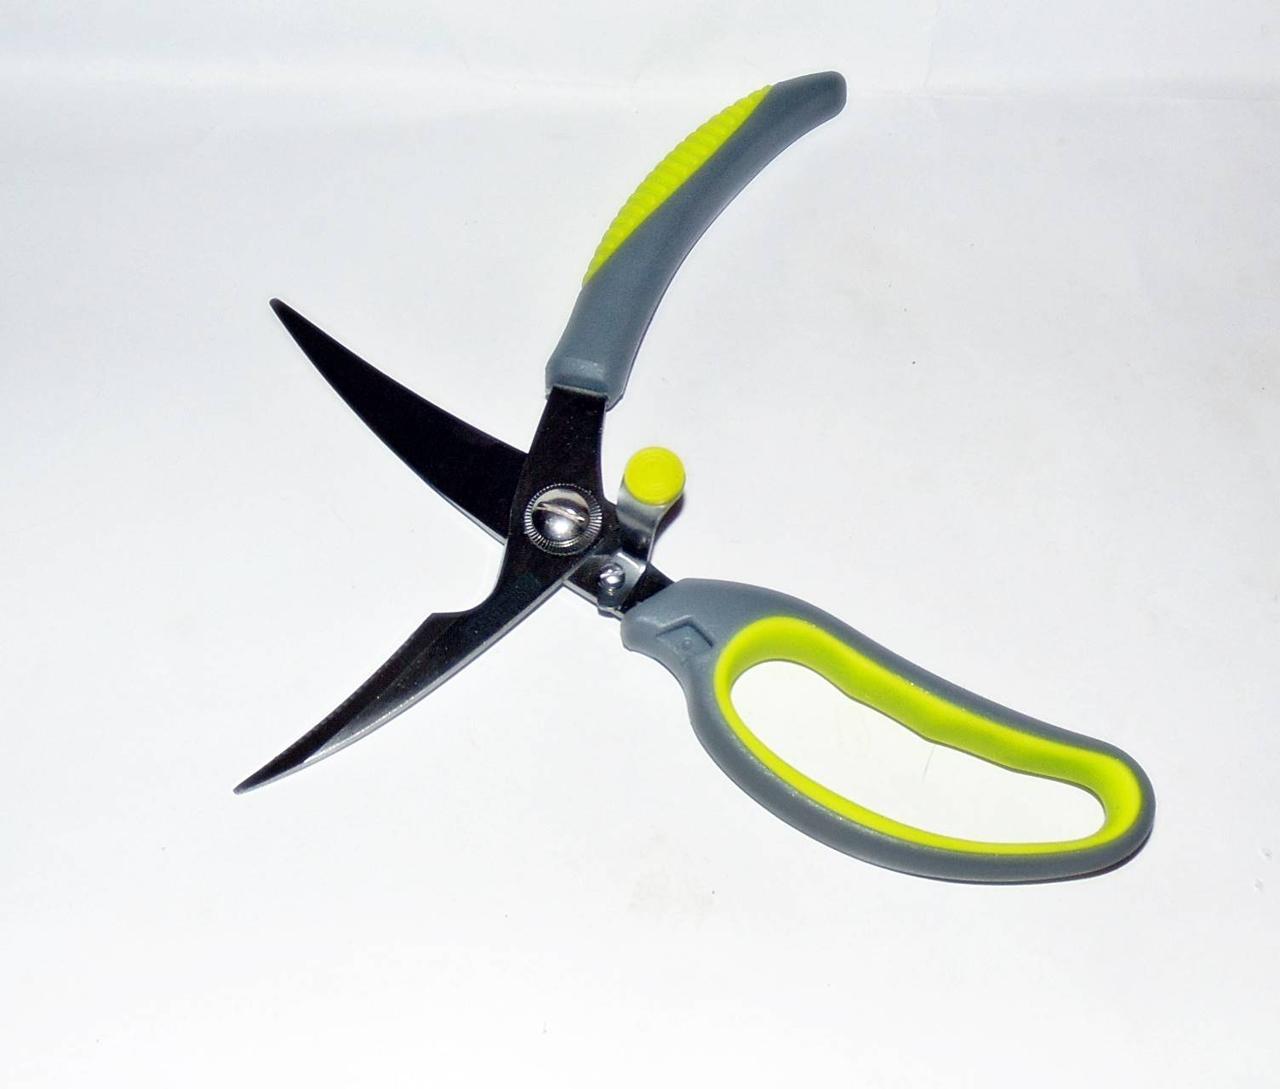 Ножницы кухонные Kamille 23см